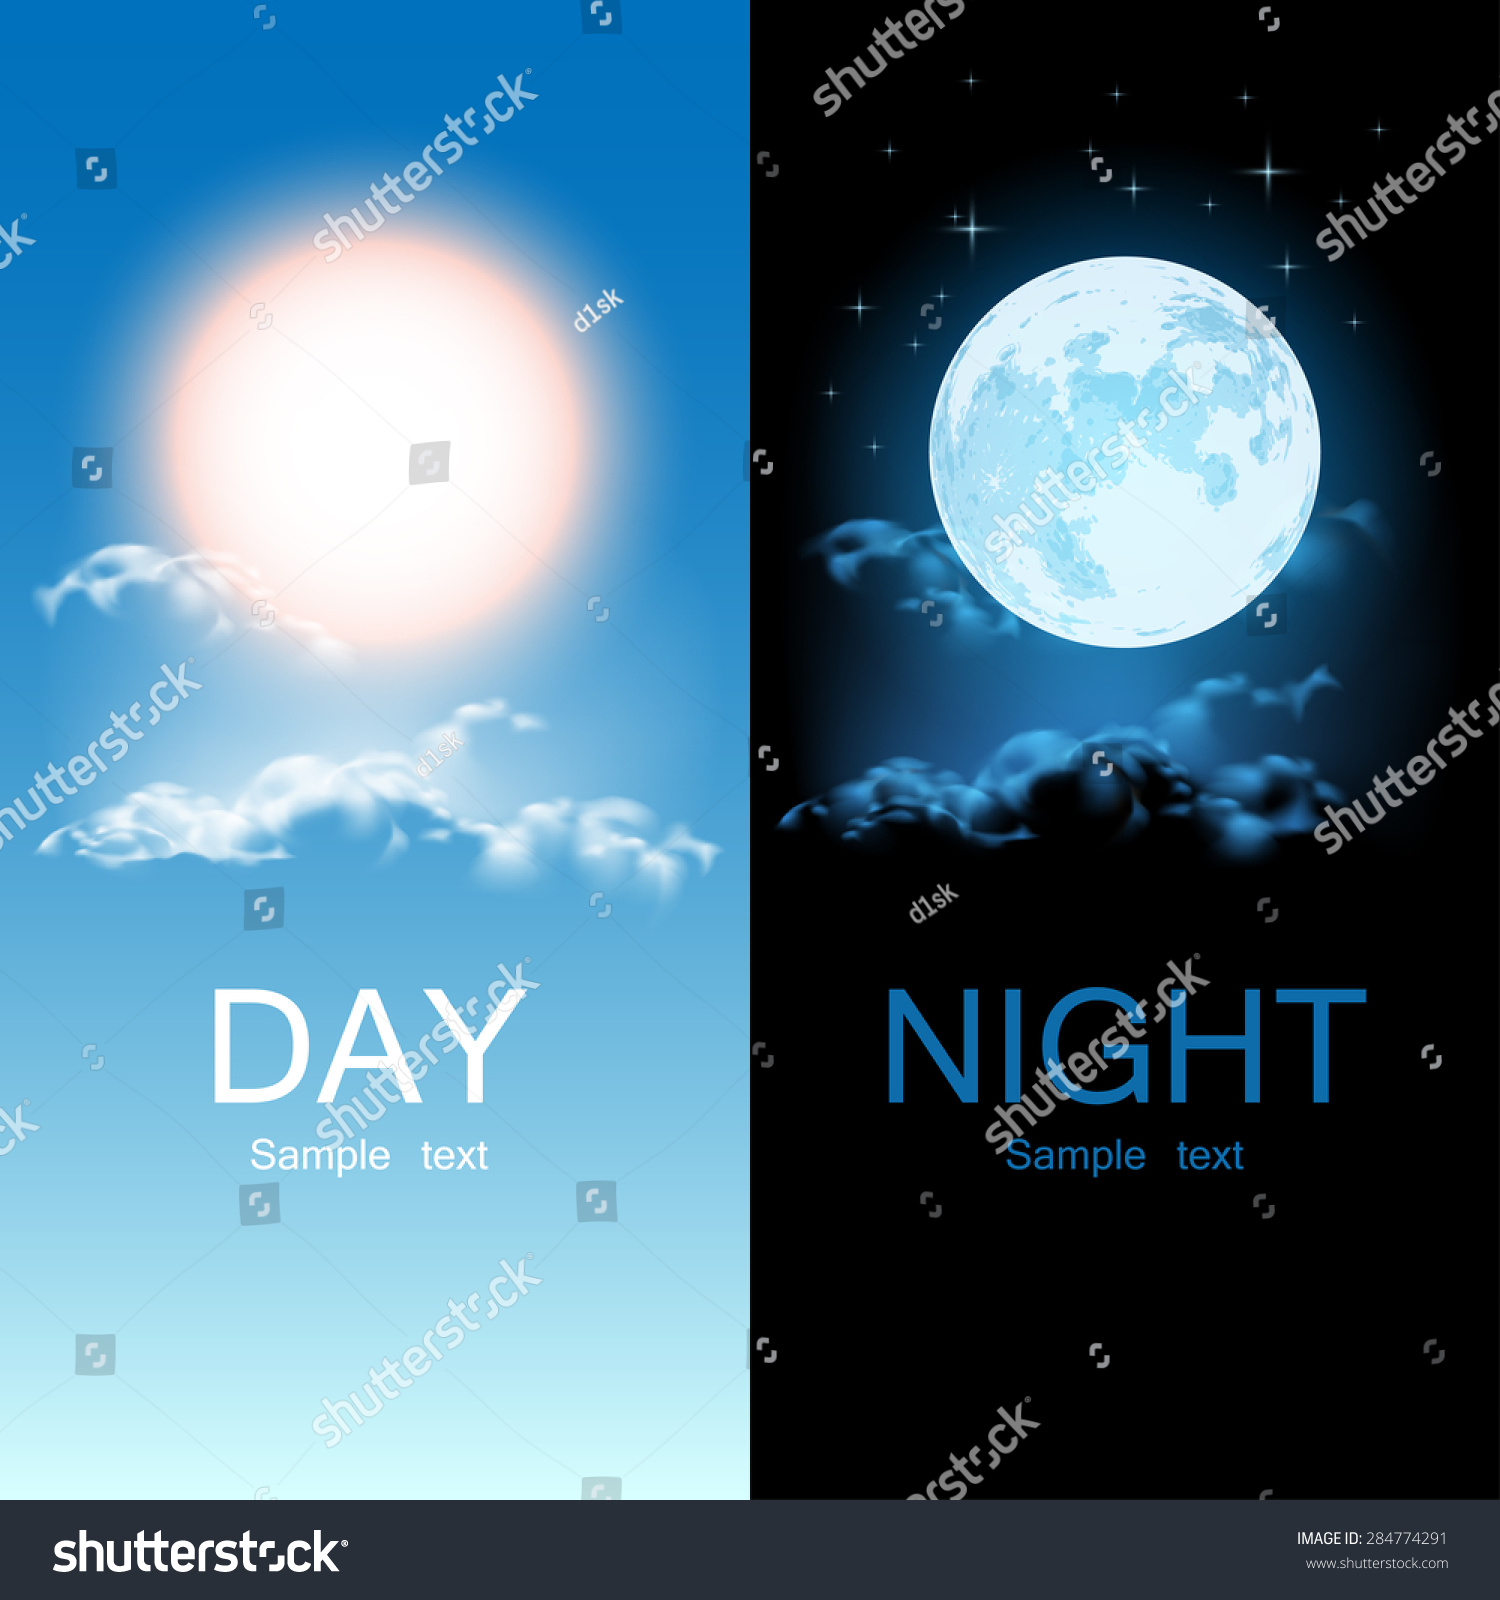 Day Night Illustration Stock Vector